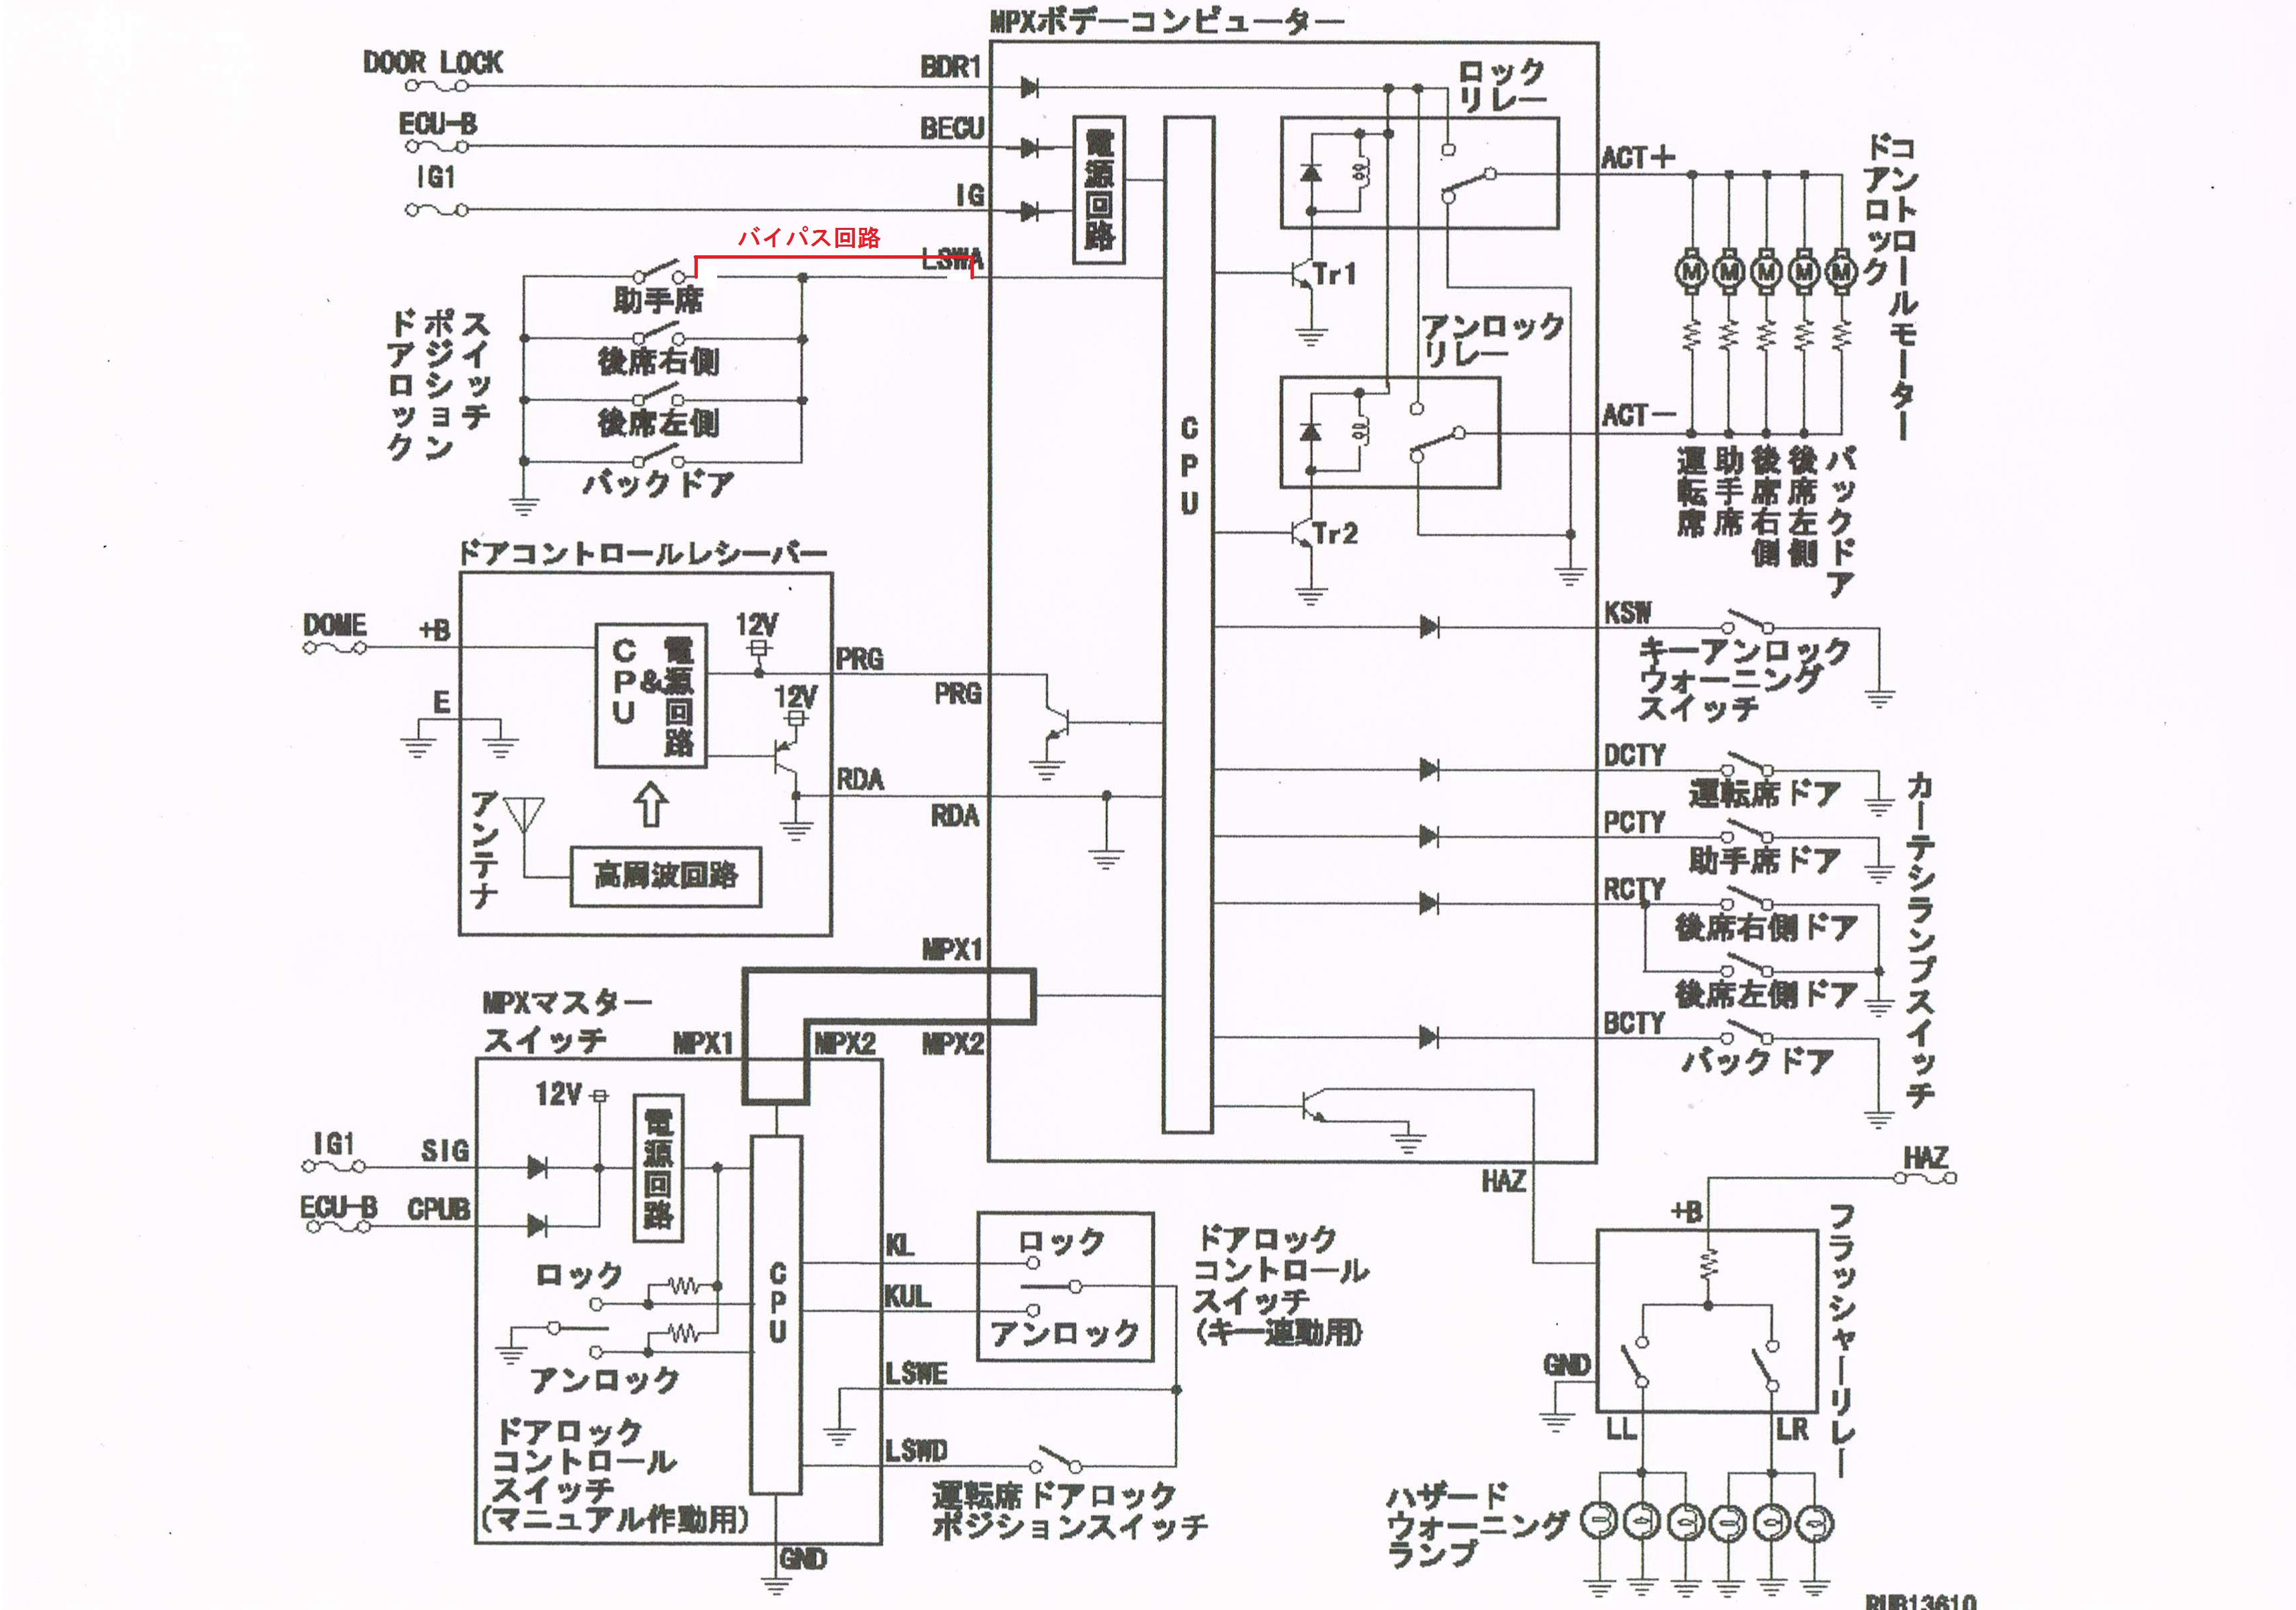 ACU25 DoorLockSystem_2